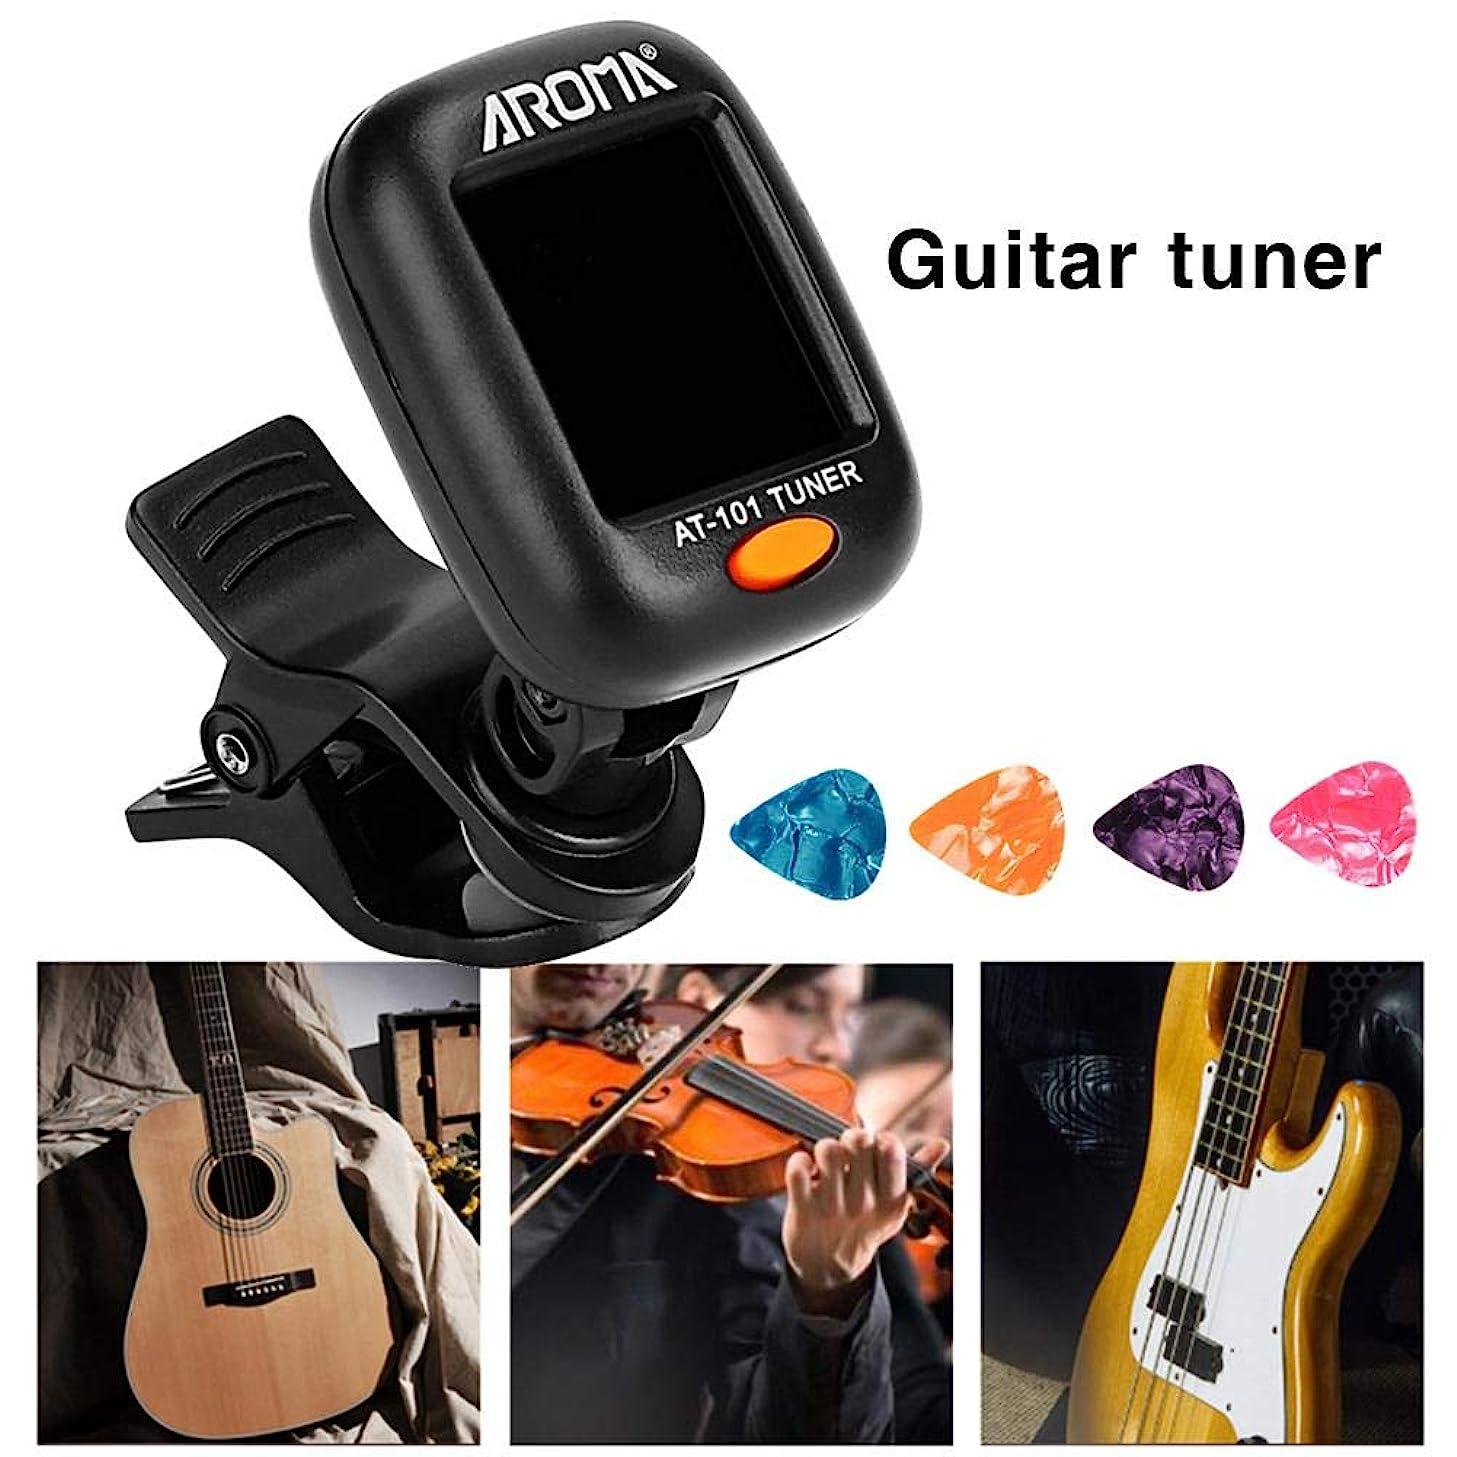 Lamptti Guitar Tuner Halftone Tuner Unit - LCD Display with 4PCS Guitar Picks